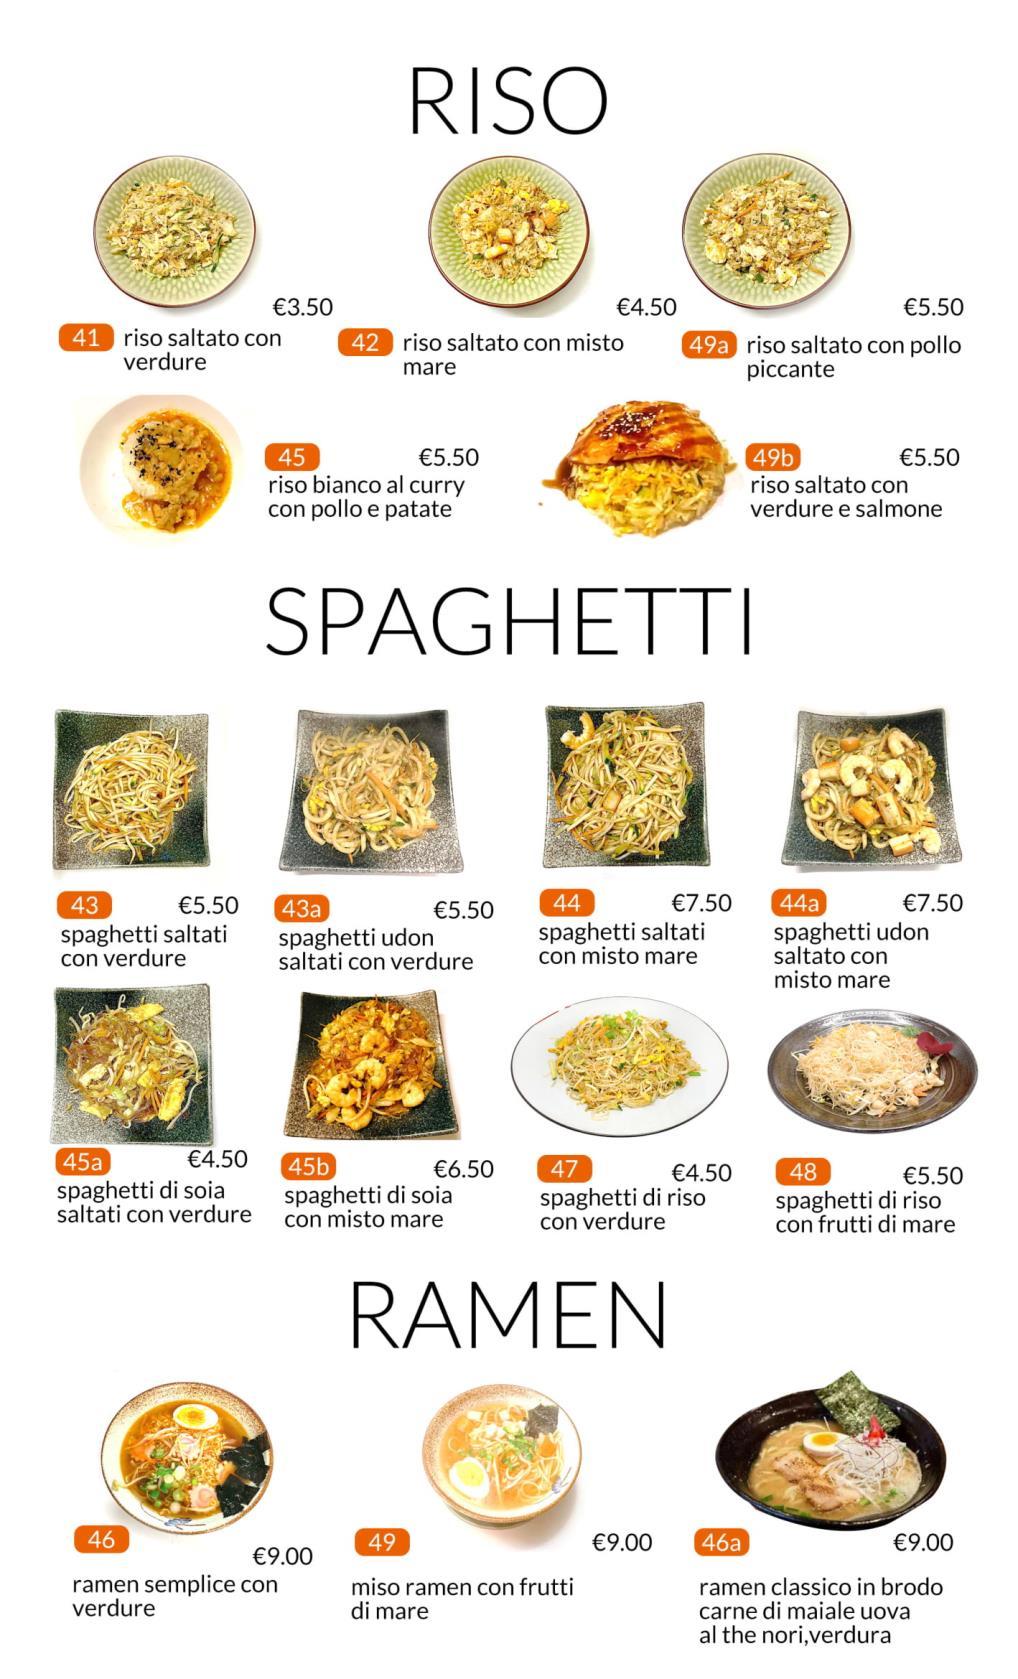 Riso e Spaghetti All you can eat Città di Castello Perugia Zen Sushi & Asian Cuisine